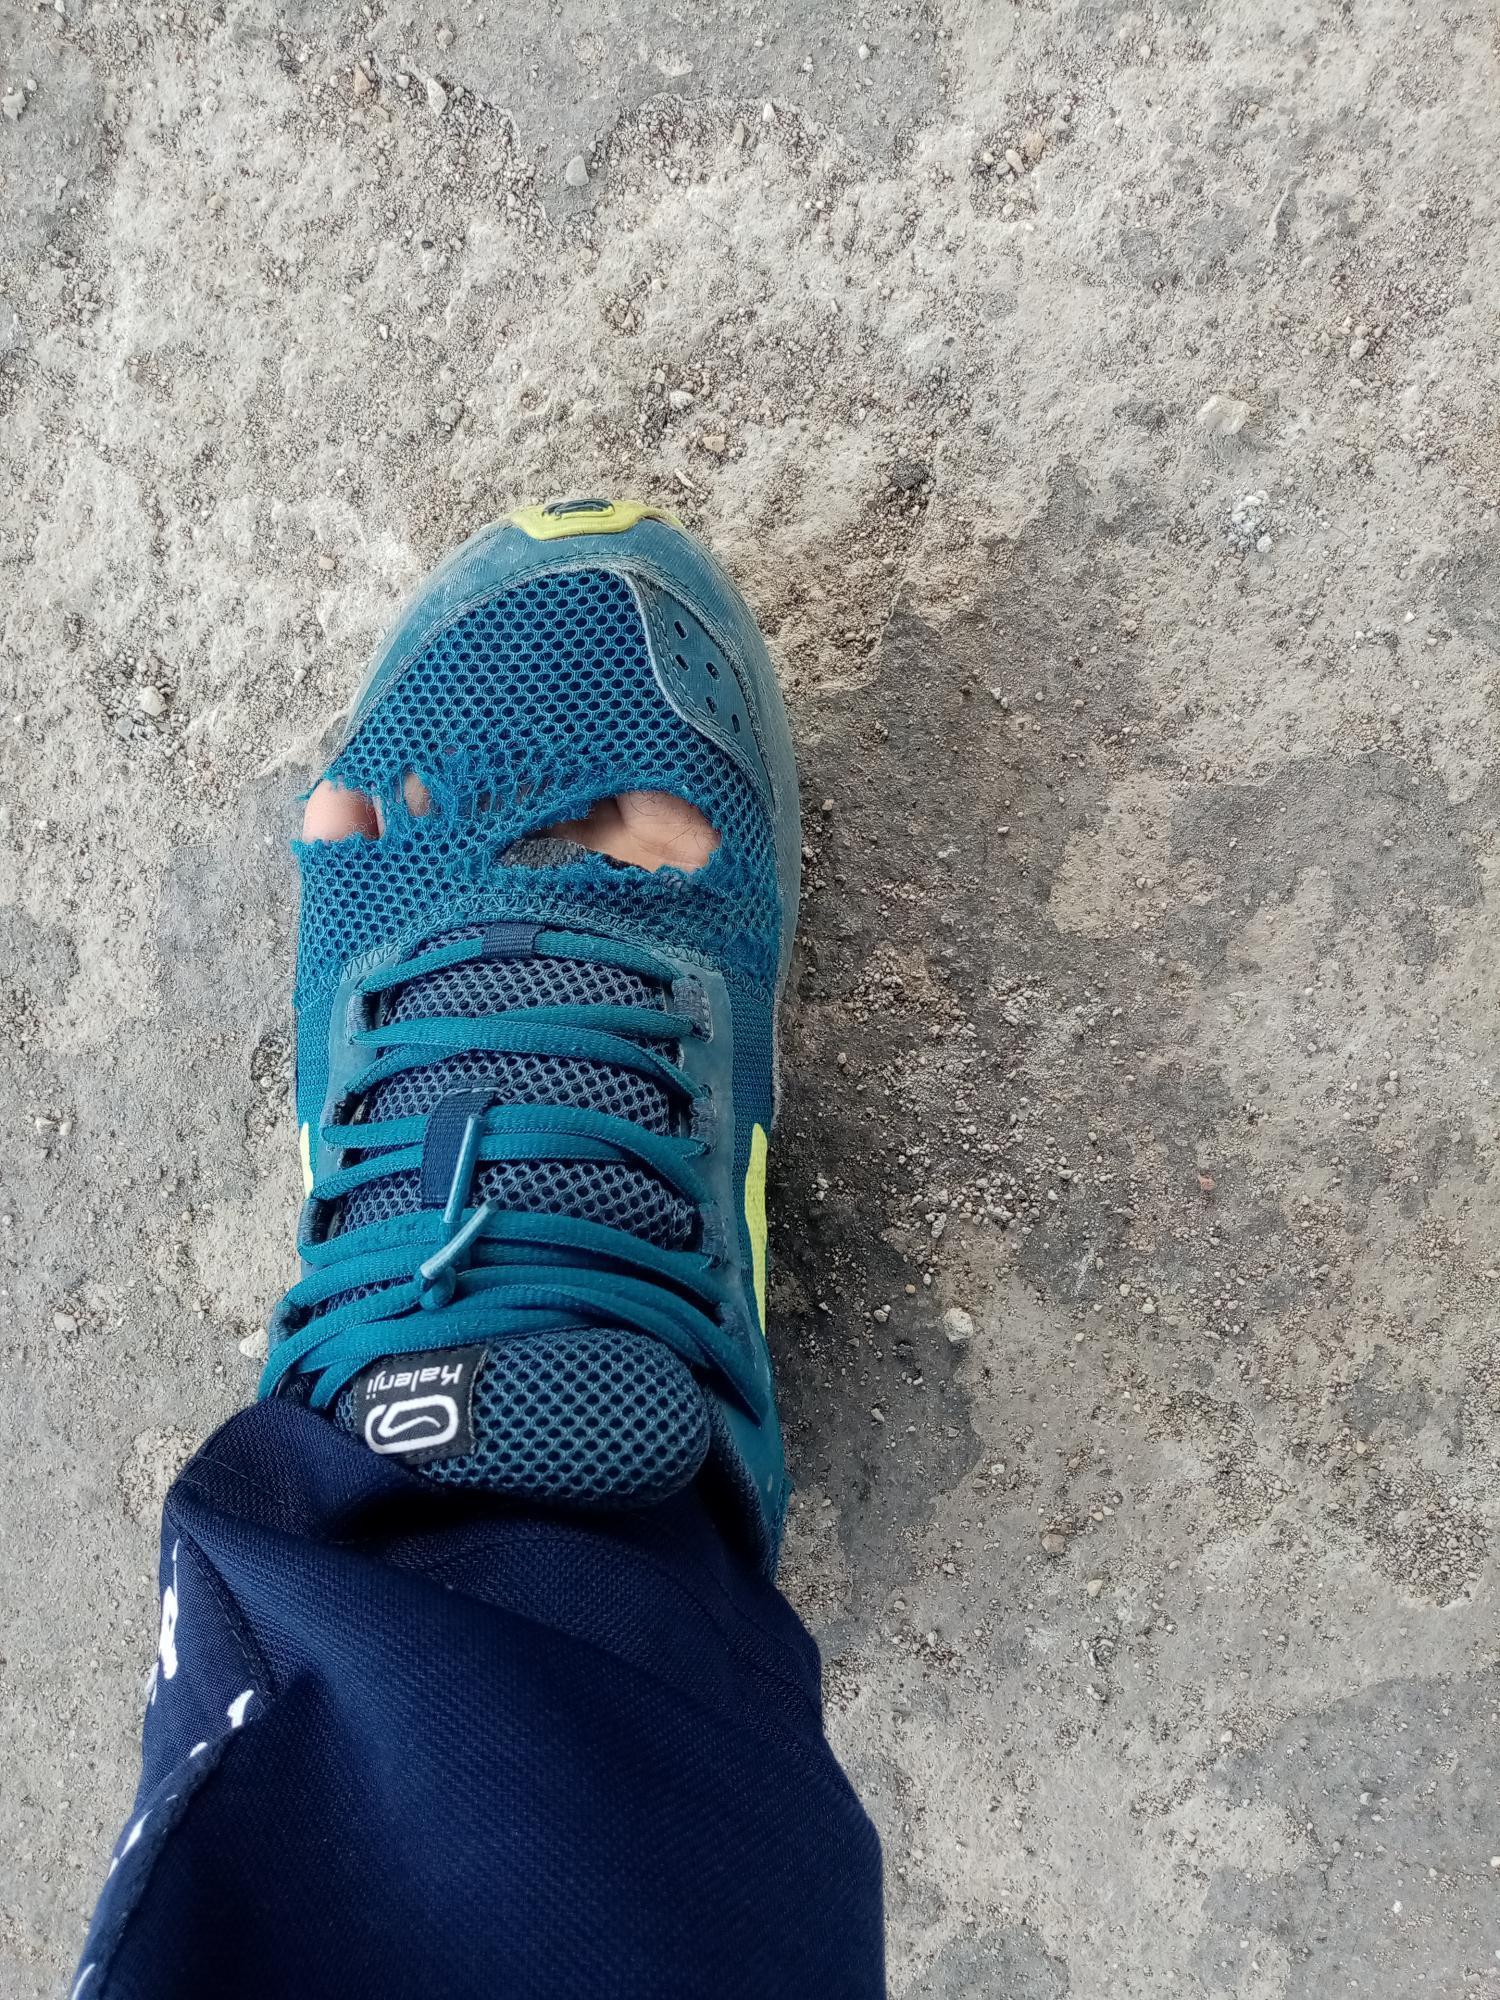 Ayakkabi Ve Kalenji Sikayetleri Sikayetvar